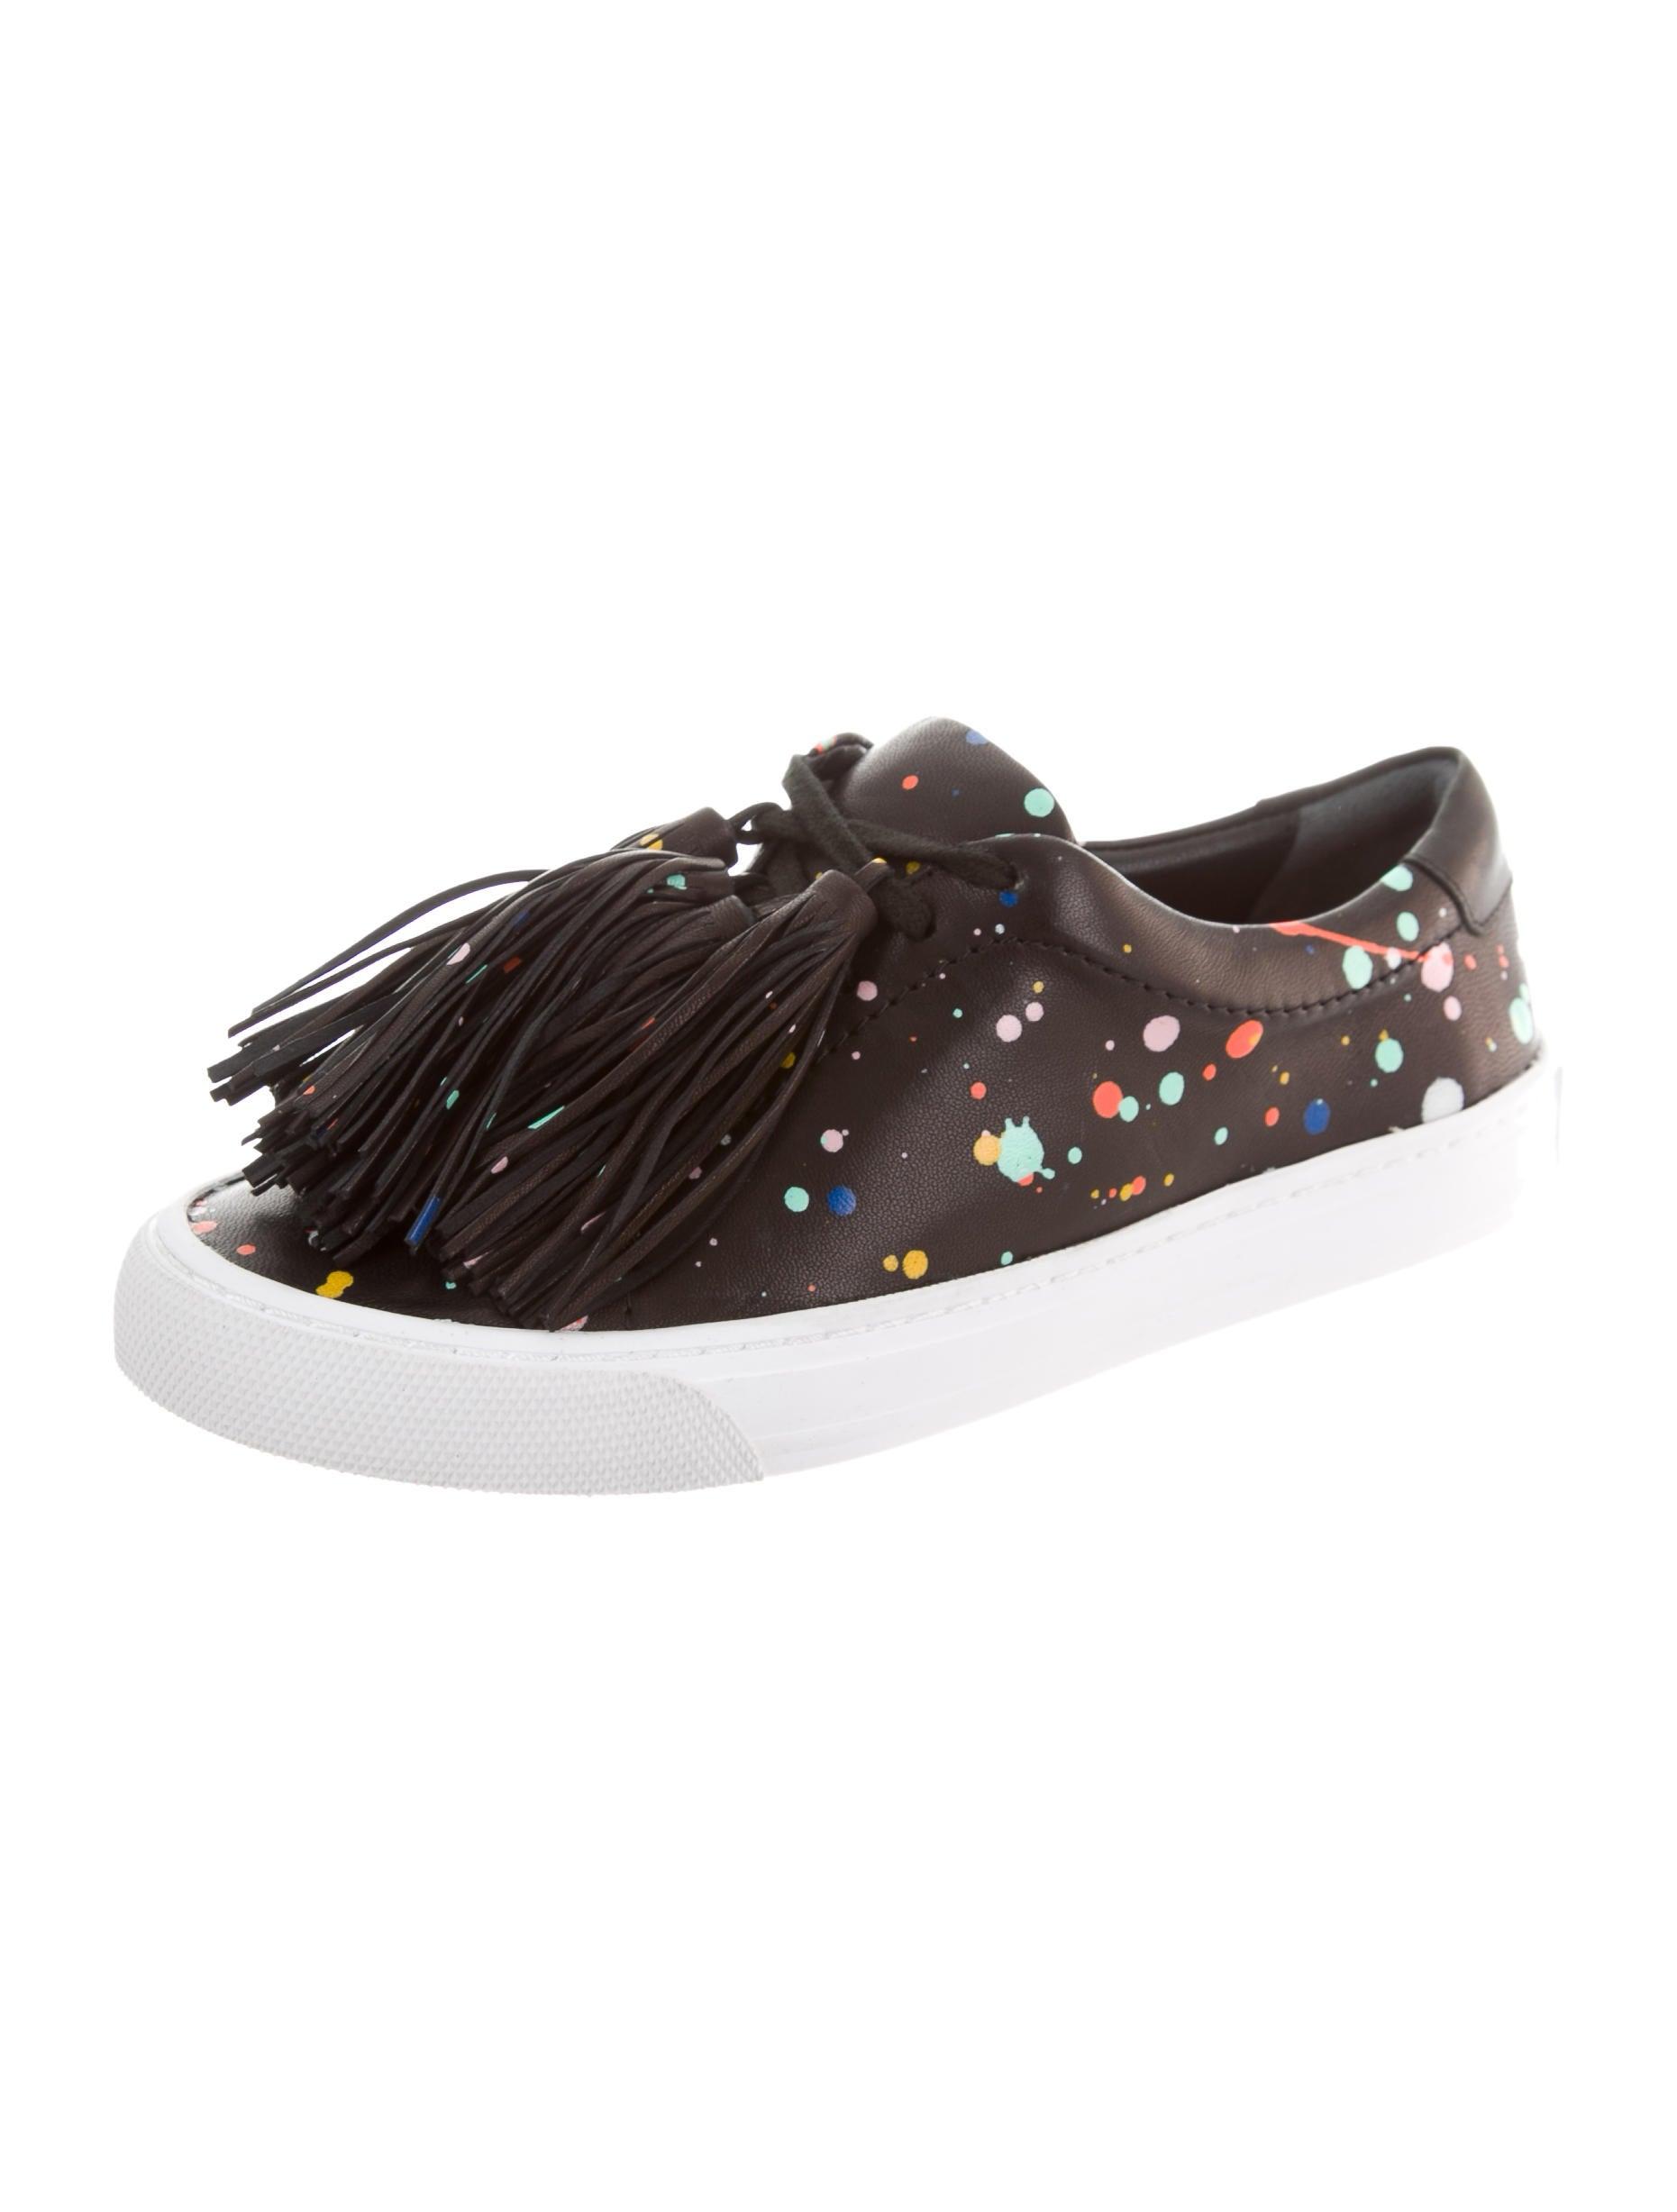 Loeffler Randall Logan Fringe Sneakers w/ Tags sale 2014 discount original footlocker cheap online really cheap price OQwWRu0M1